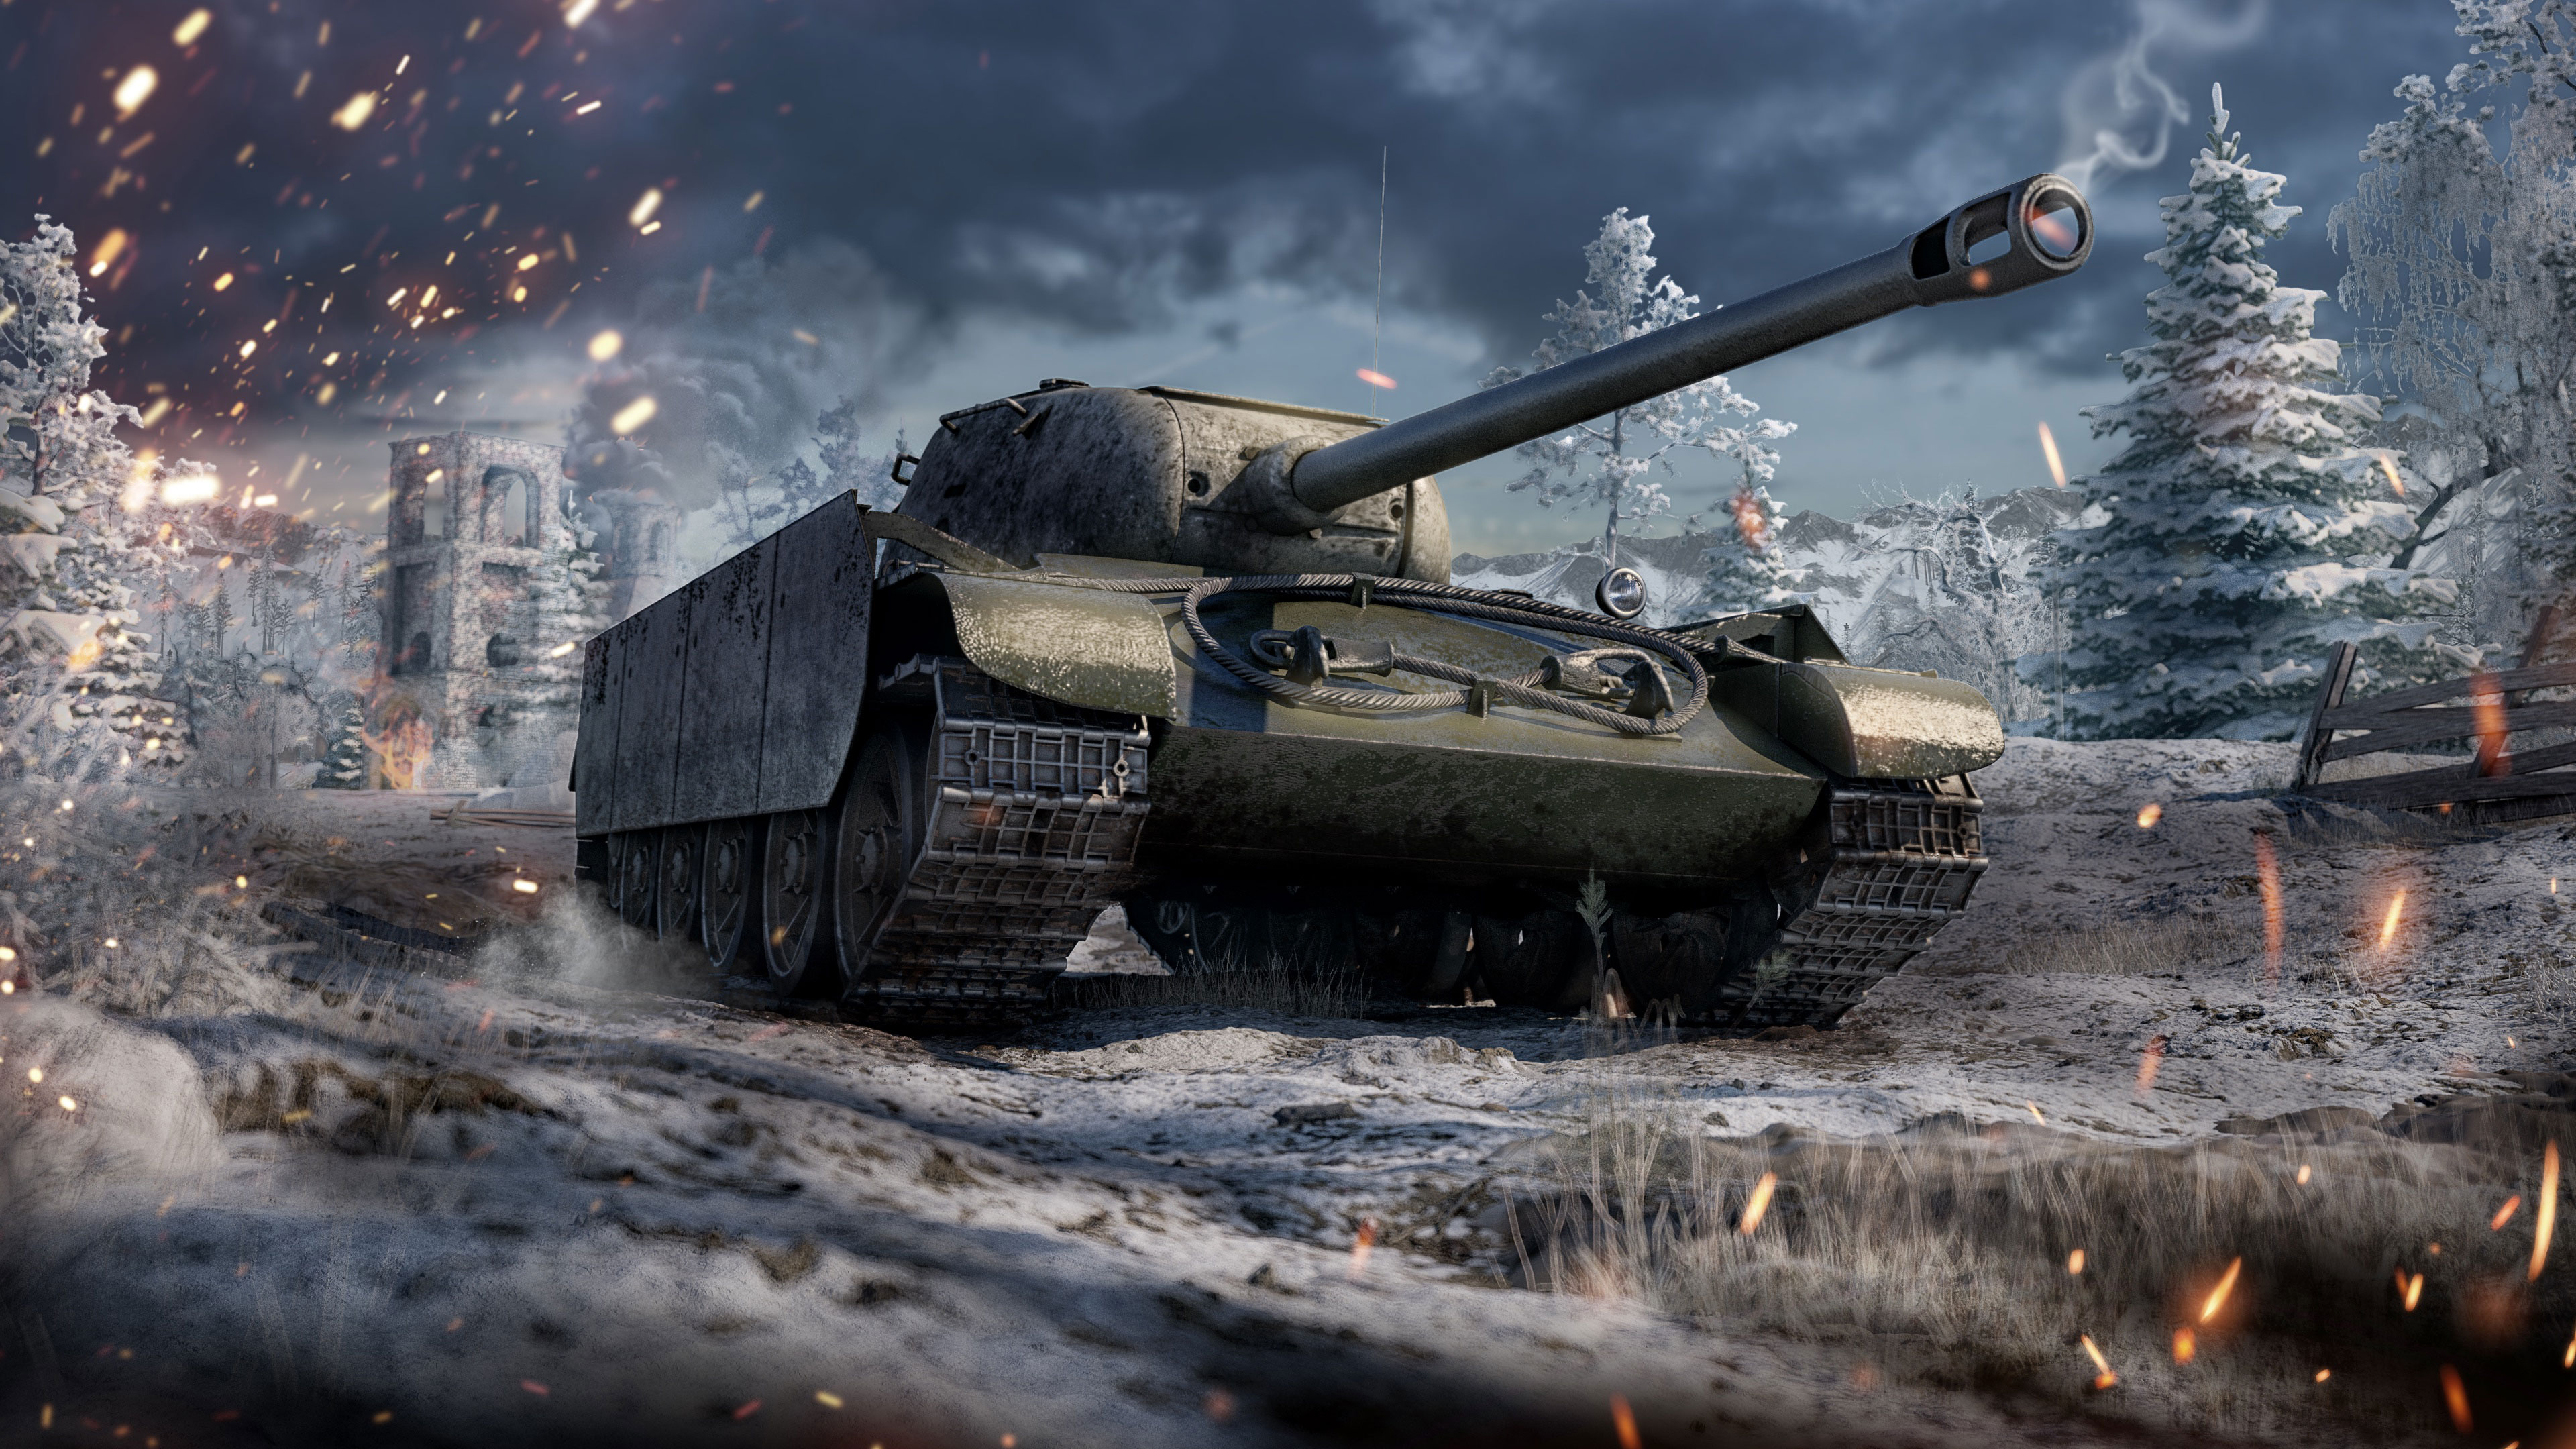 картинки вот танки кричу надрывом небосводу